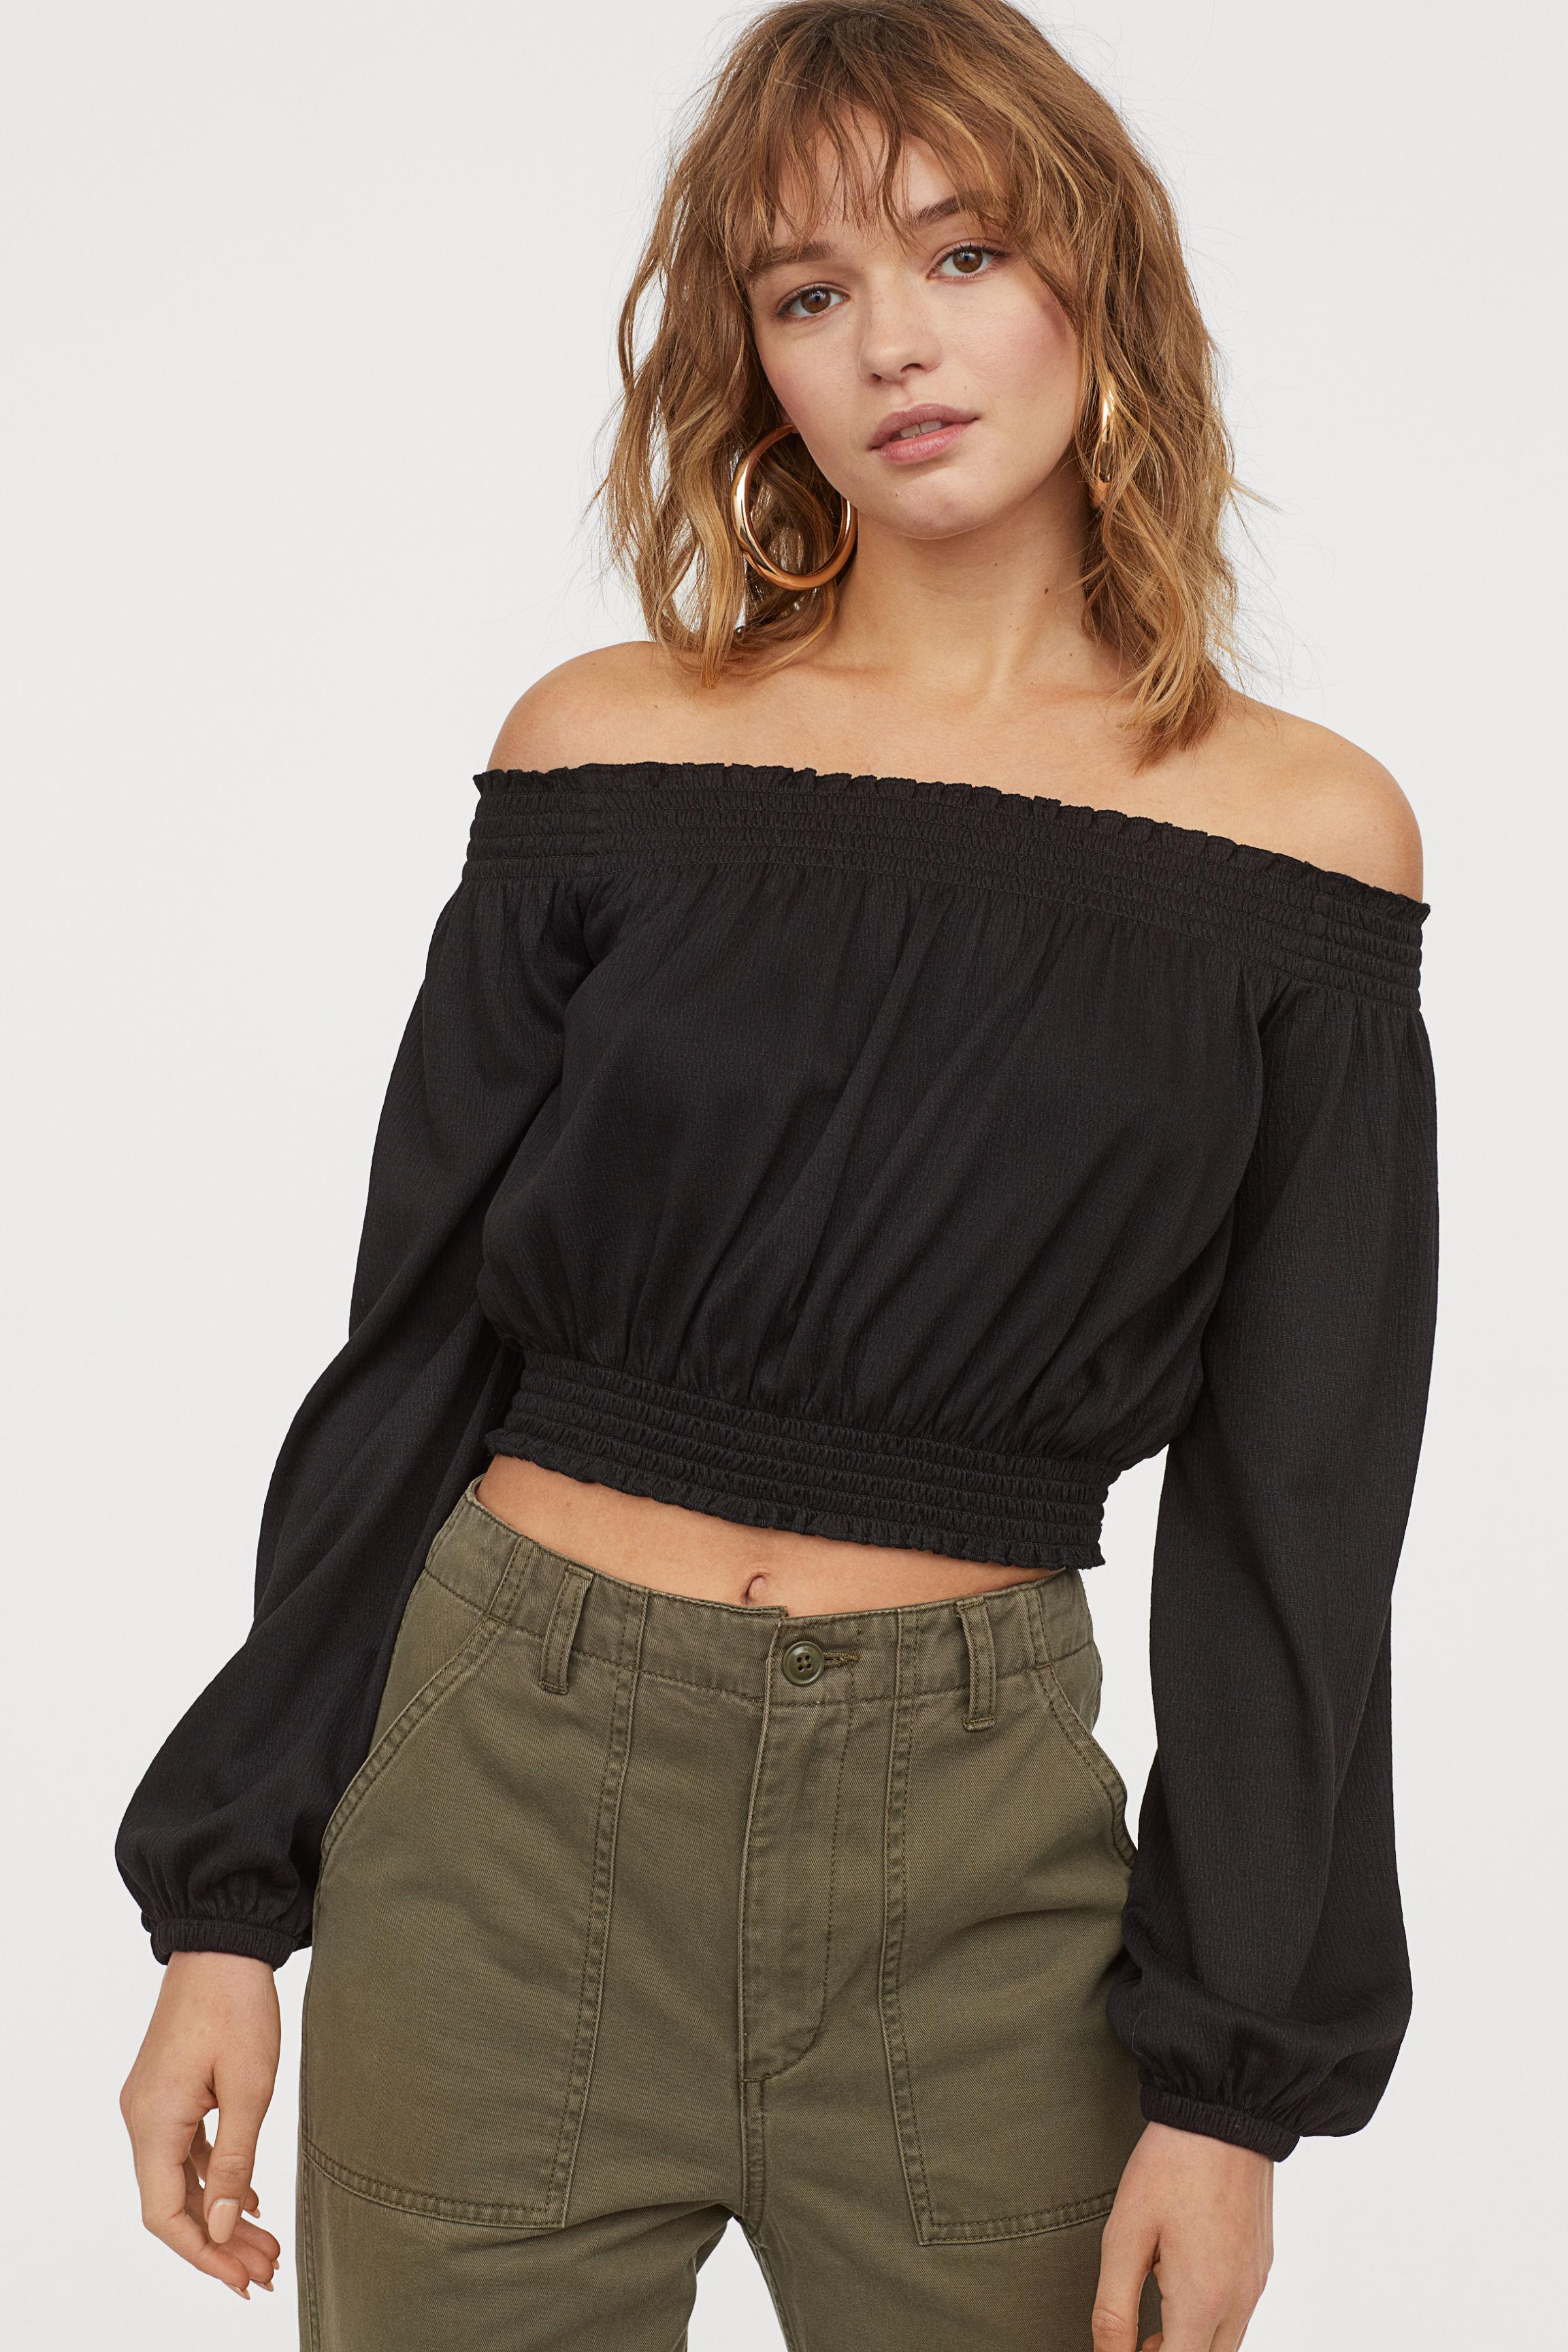 Off-the-shoulder Top - Black - Ladies | H&M US